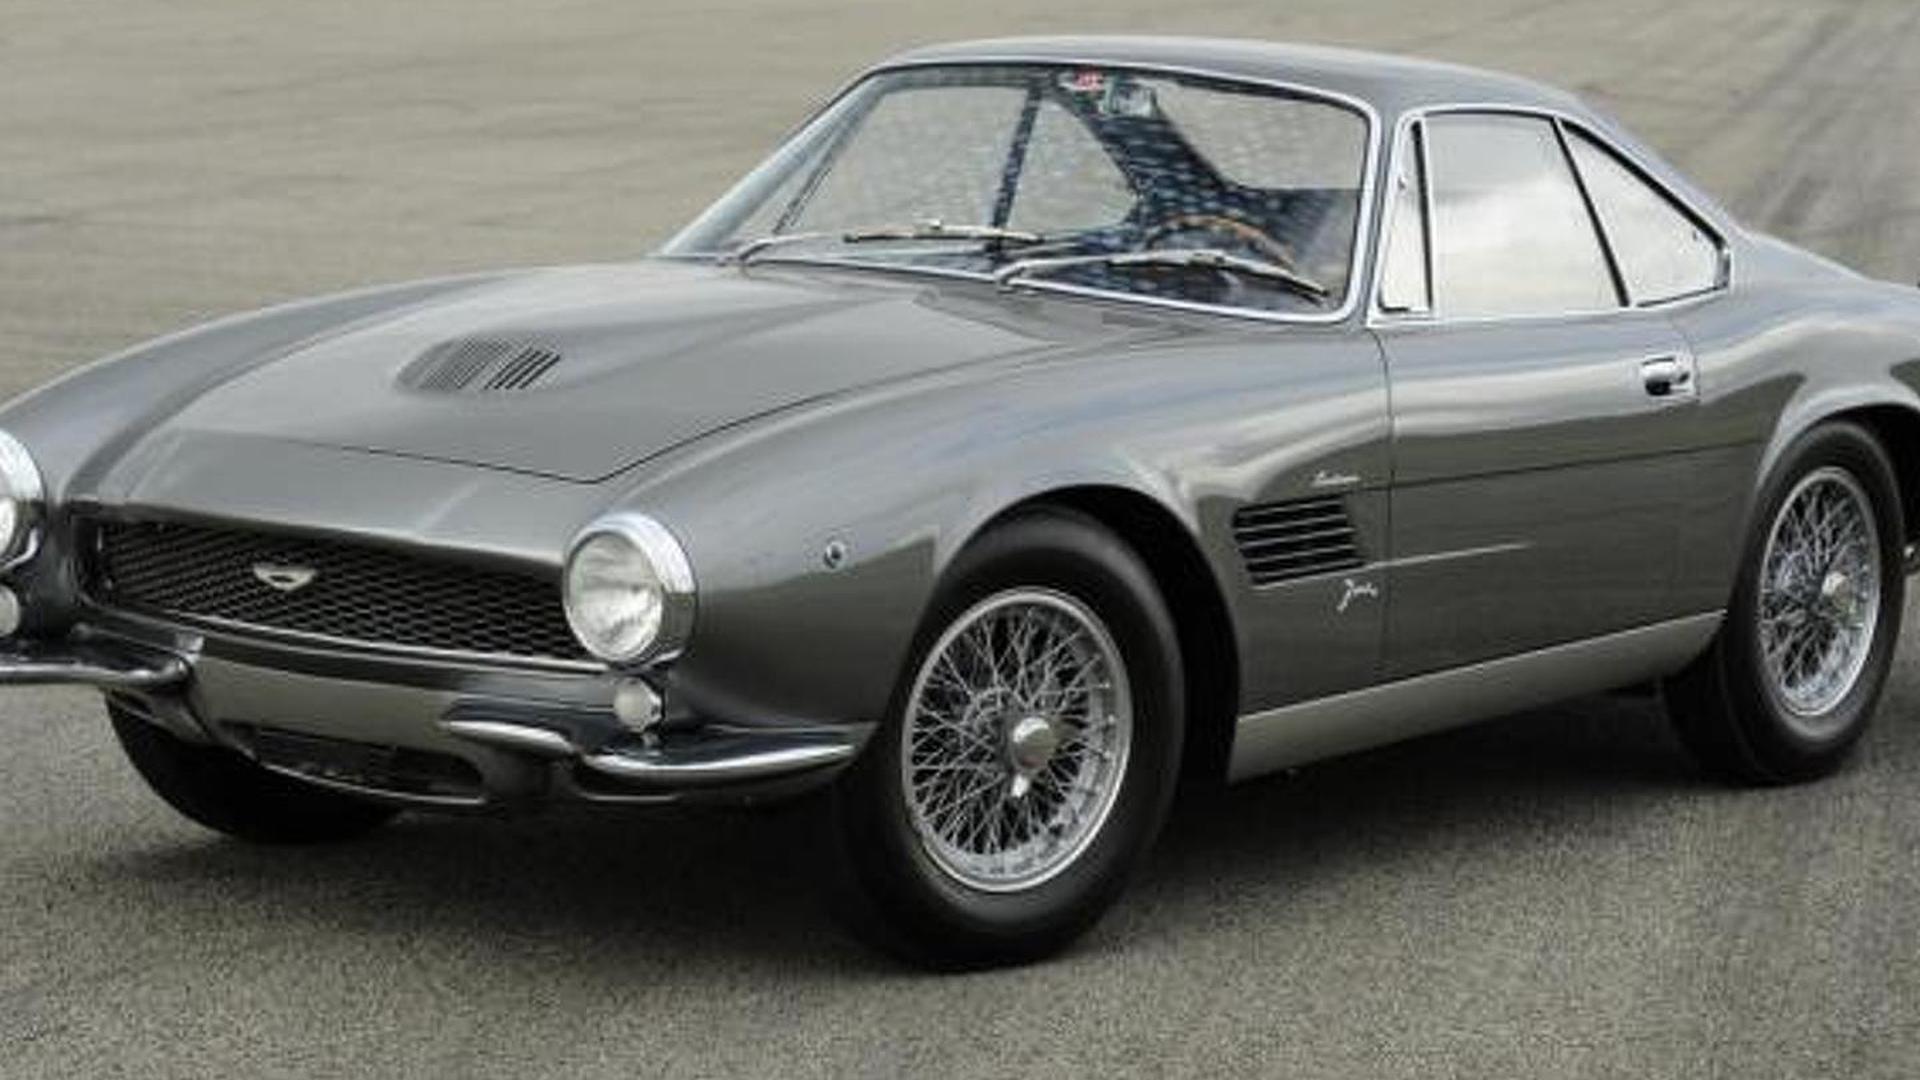 1960 Aston Martin Db4 Gt Bertone Jet Sold For 4 9m Usd